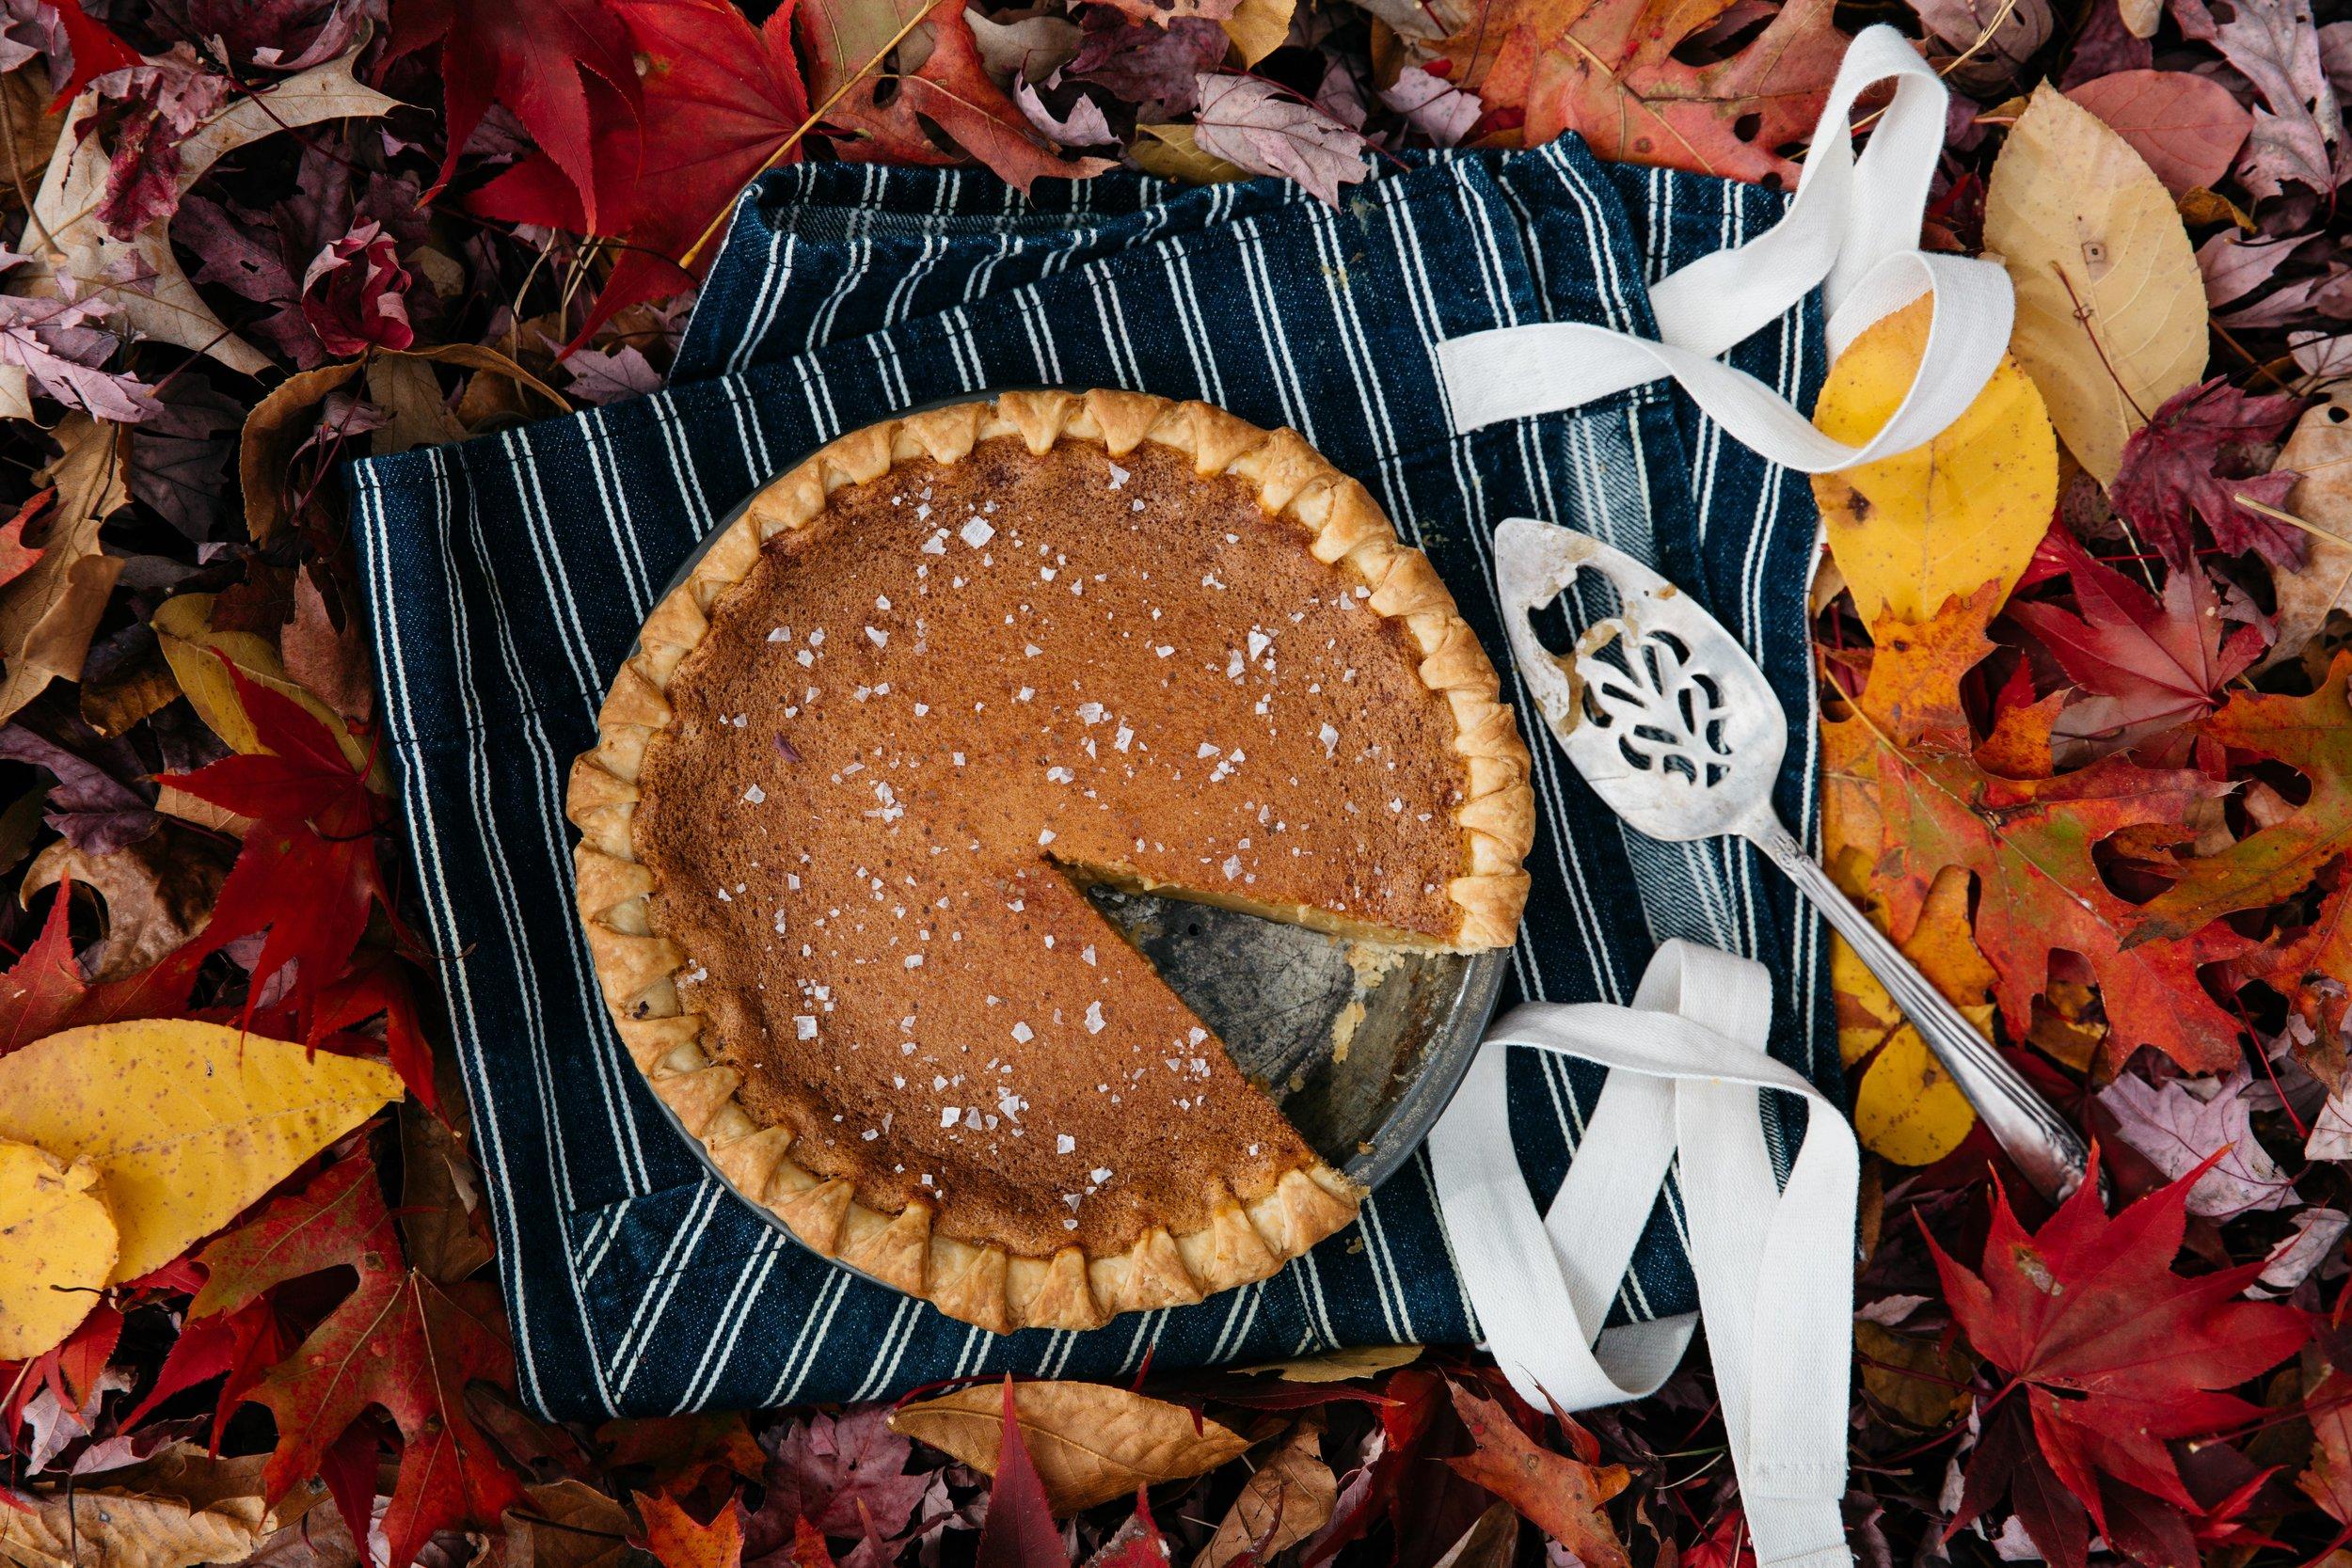 PatrickMichaelChin_SaltyHoneyPie_Thanksgiving_Food_Photography.jpg